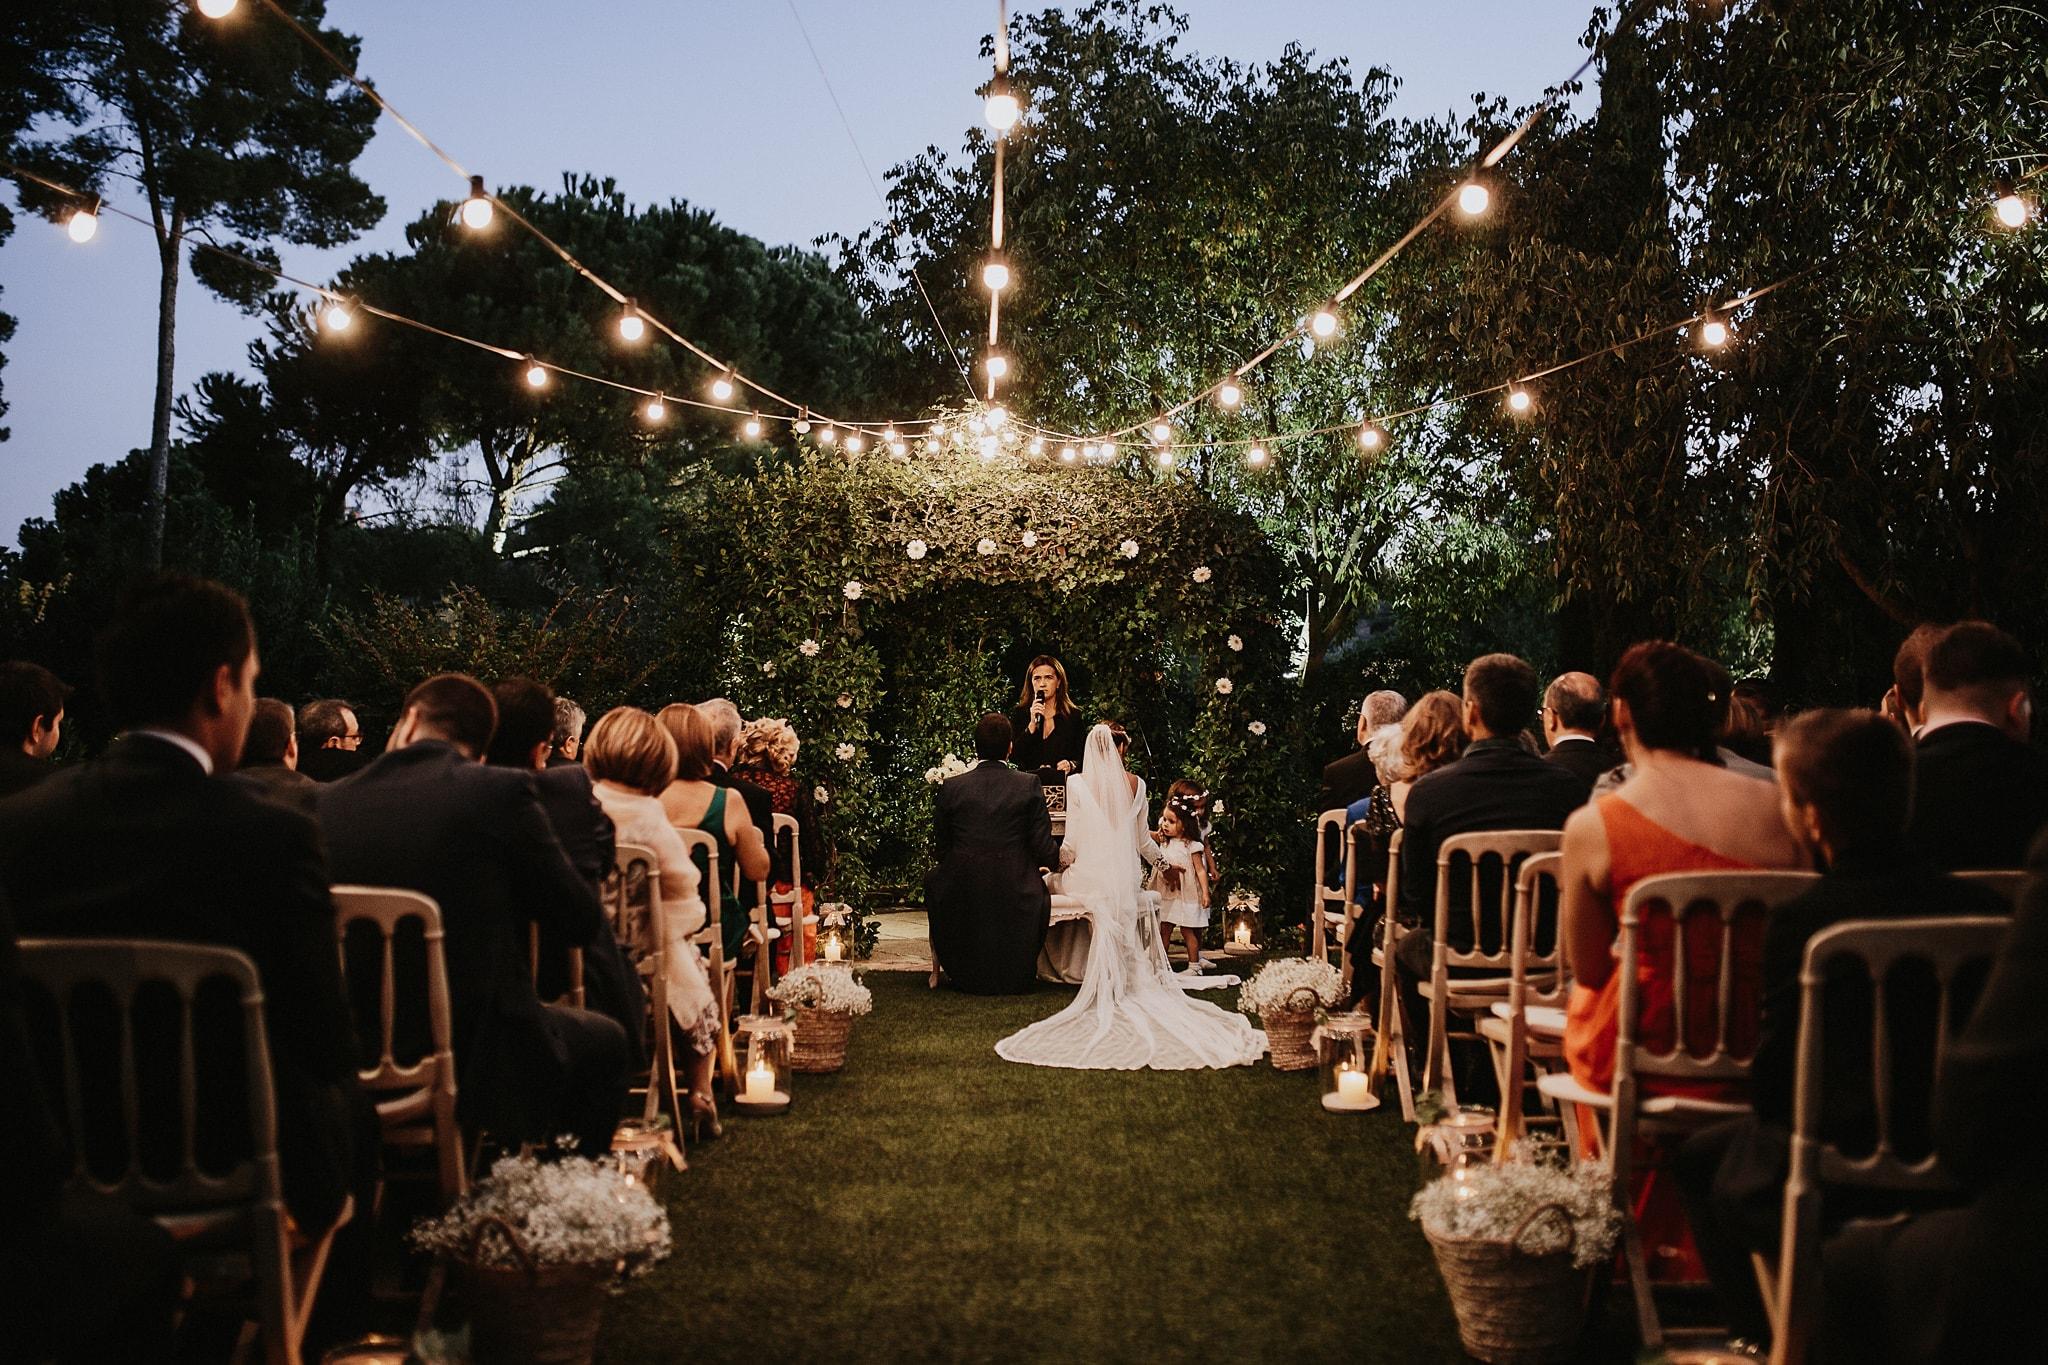 prisma-blanco-fotografos-bodas-toledo-133